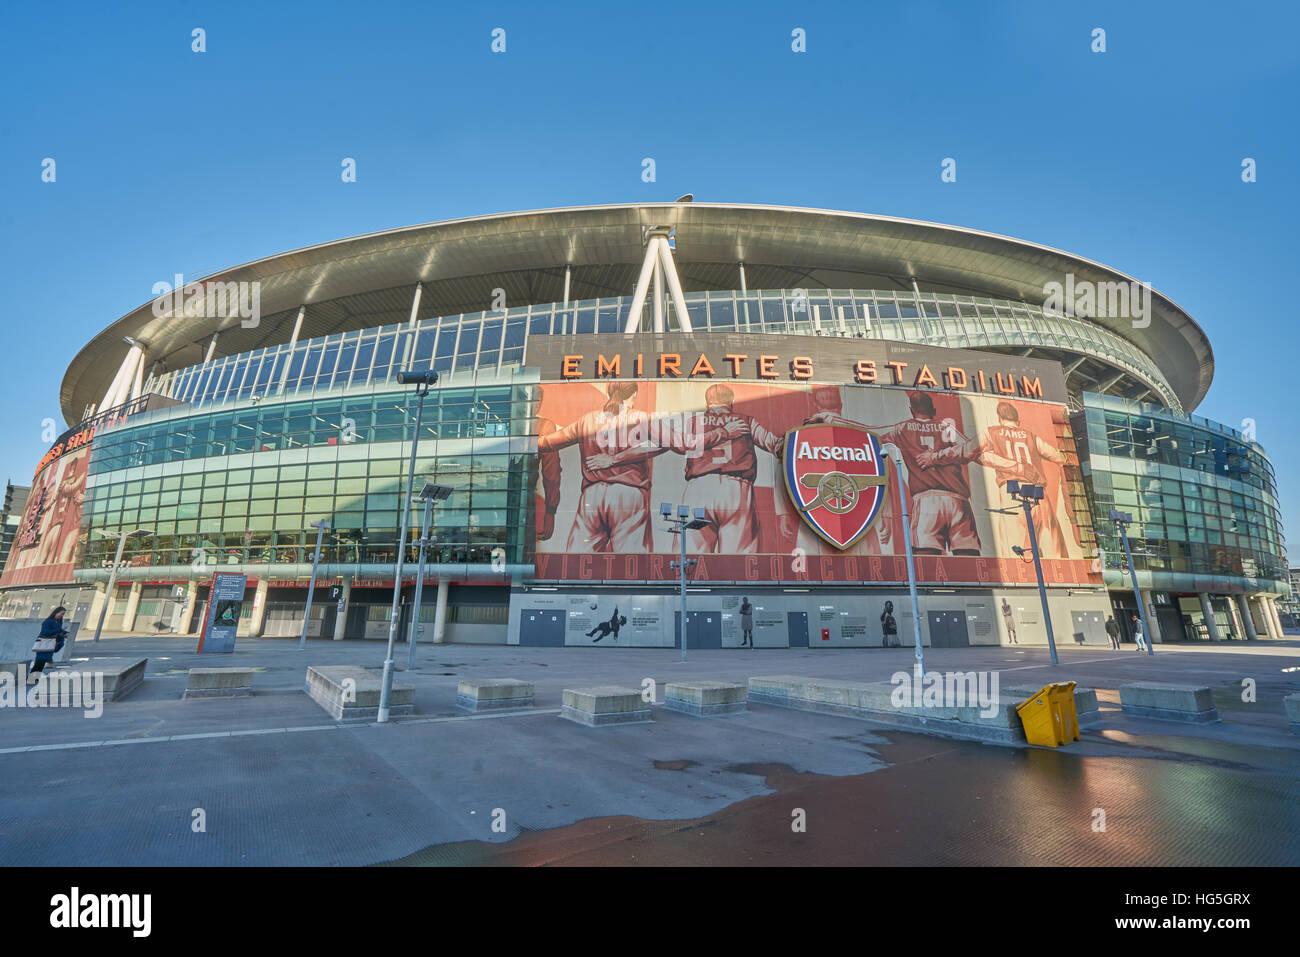 Arsenal football stadium.  Emirates stadium - Stock Image